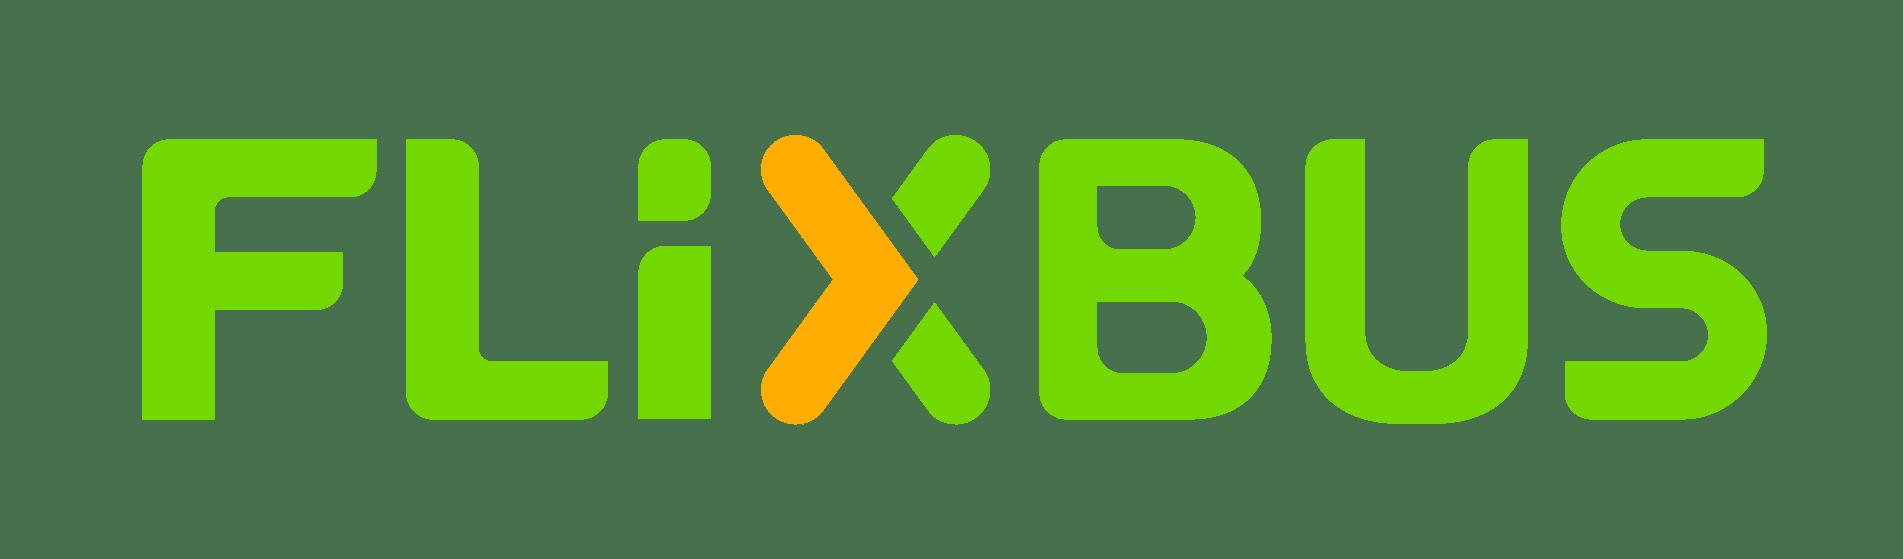 FlixMobility company logo